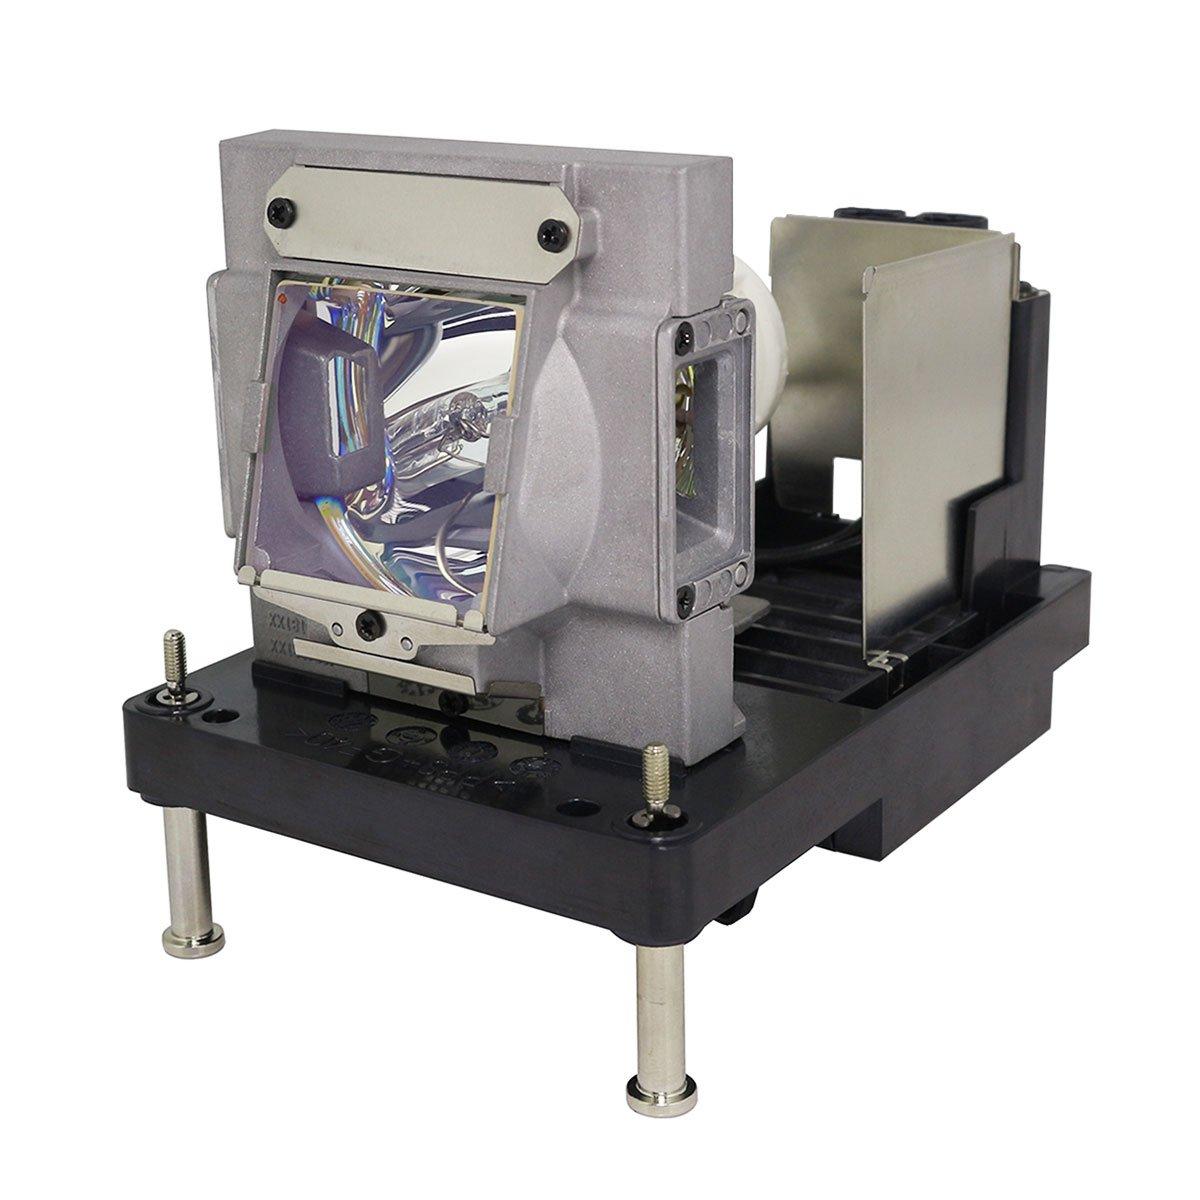 Ceybo E-Vision WUXGA 7500 ランプ/電球交換 ハウジング付き デジタルプロジェクター用   B07PDBWM7B